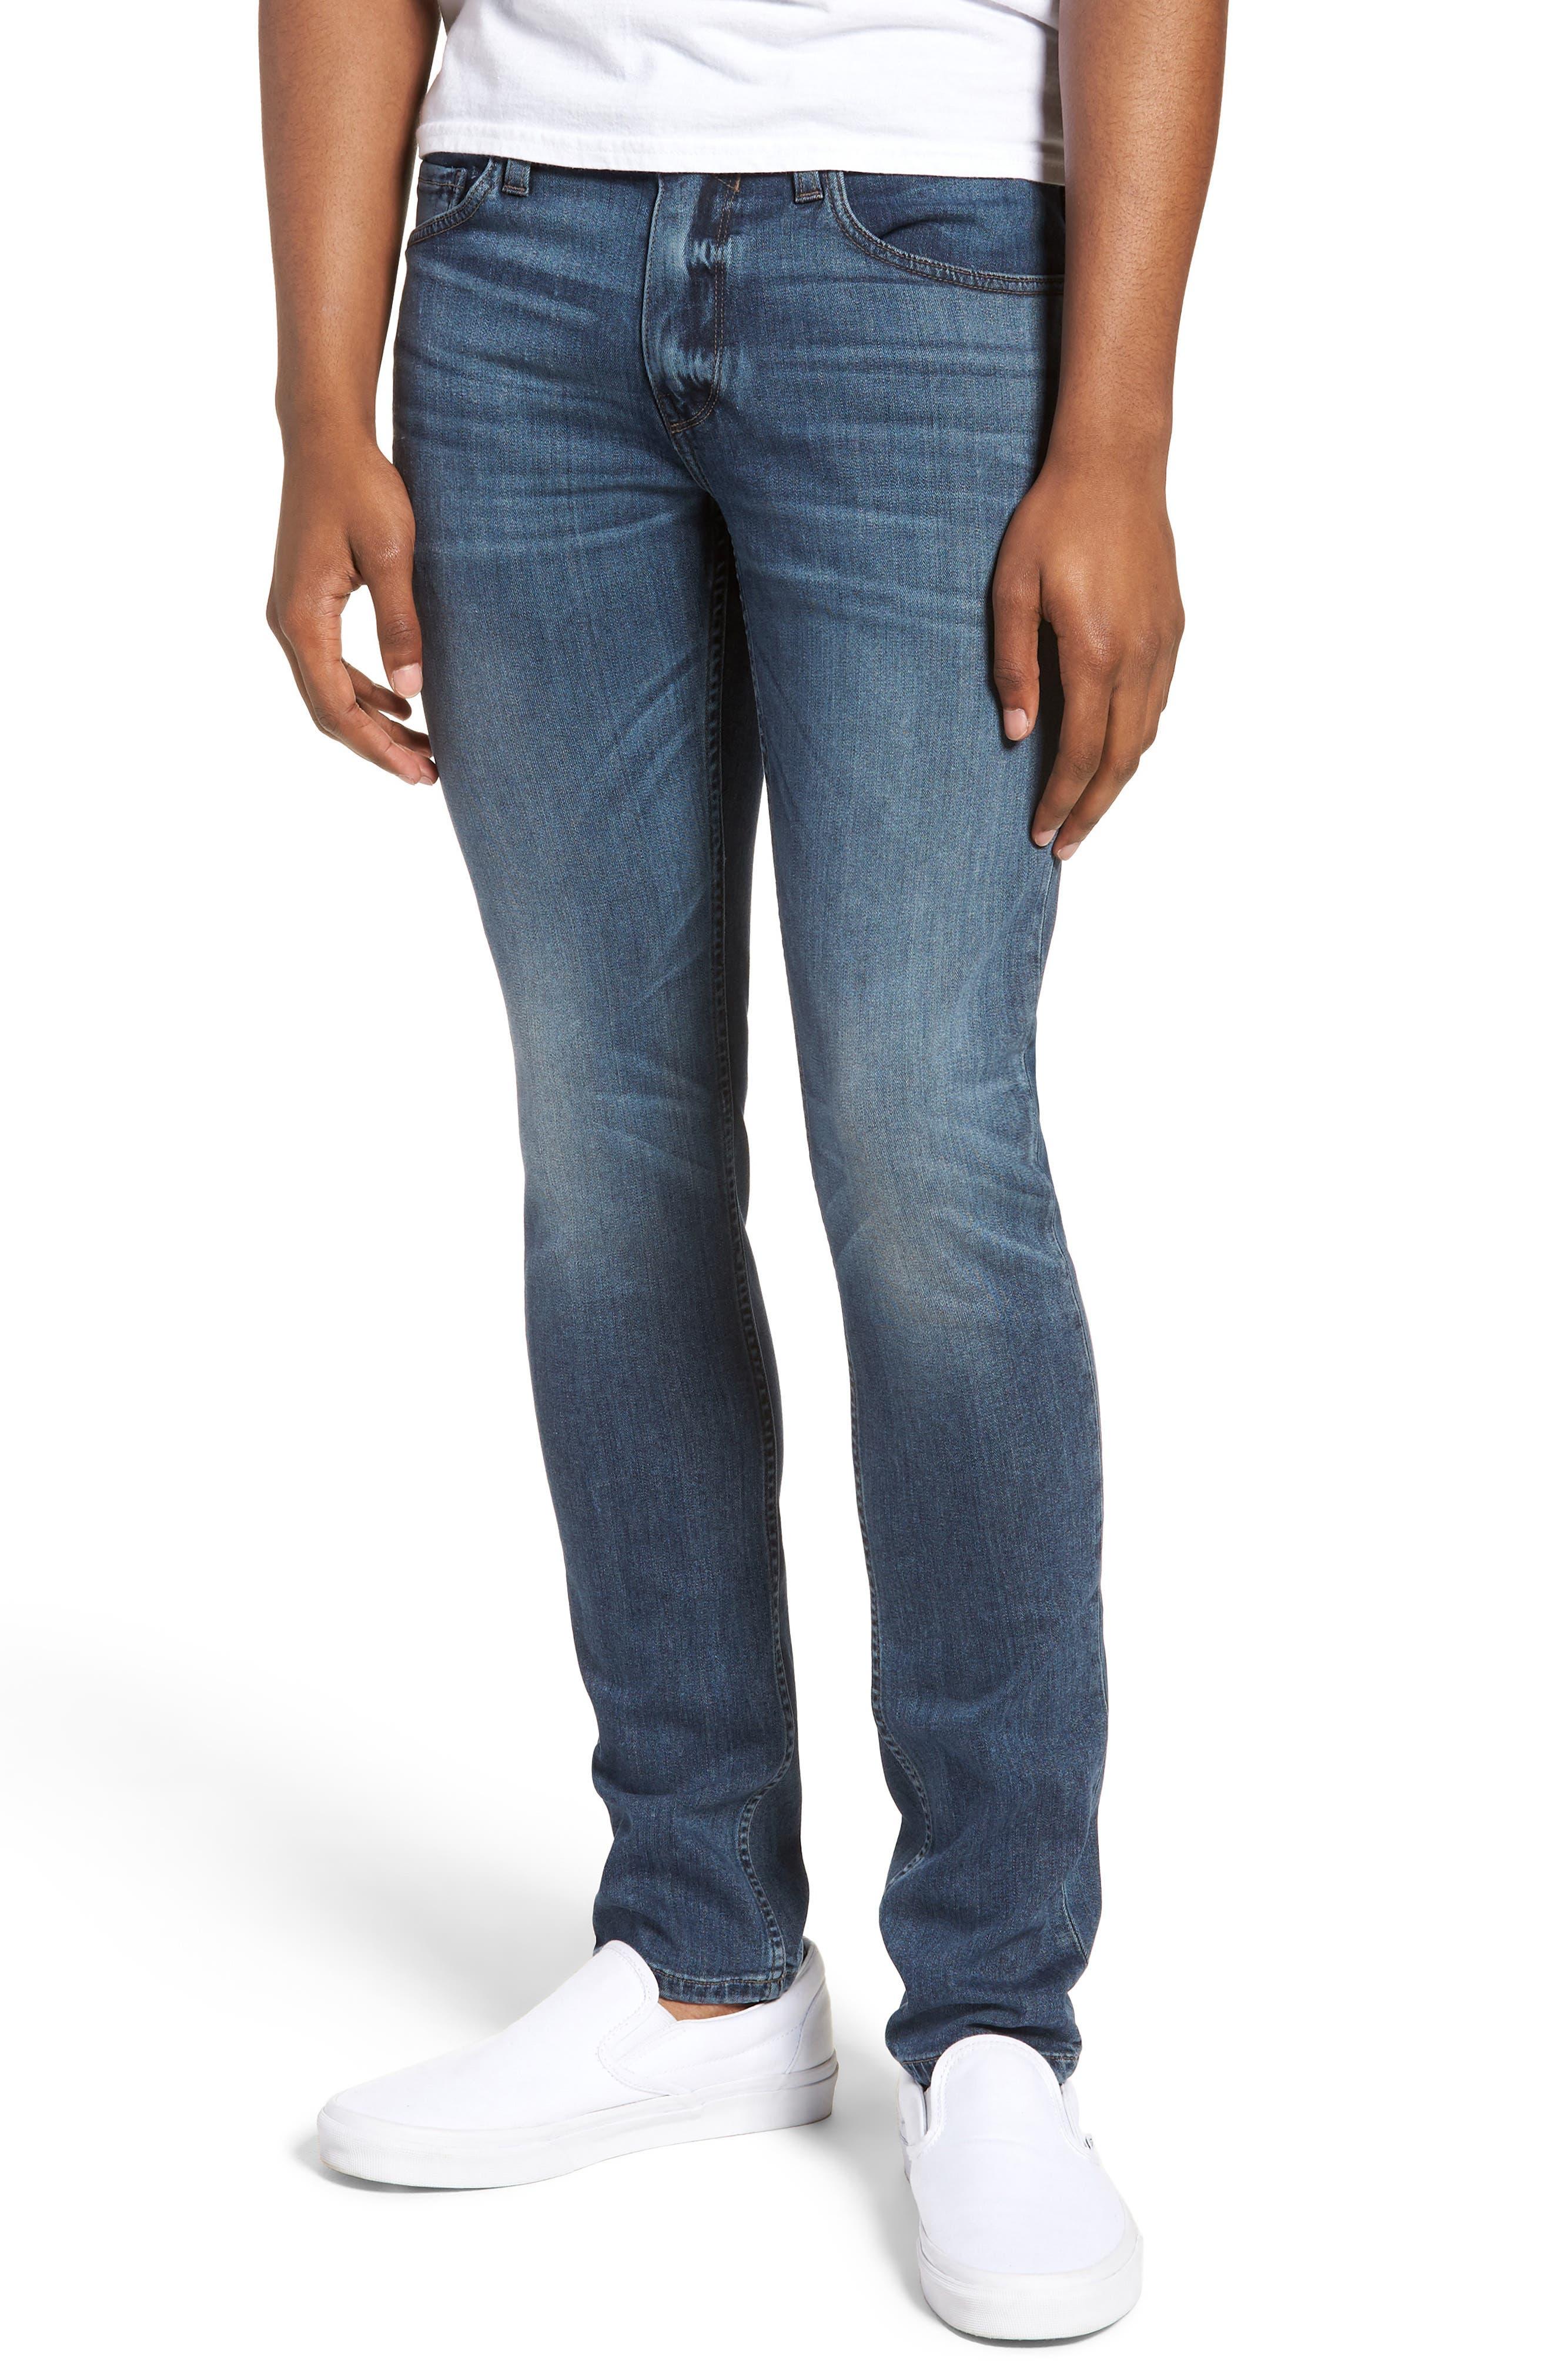 Transcend - Croft Skinny Fit Jeans,                             Main thumbnail 1, color,                             400